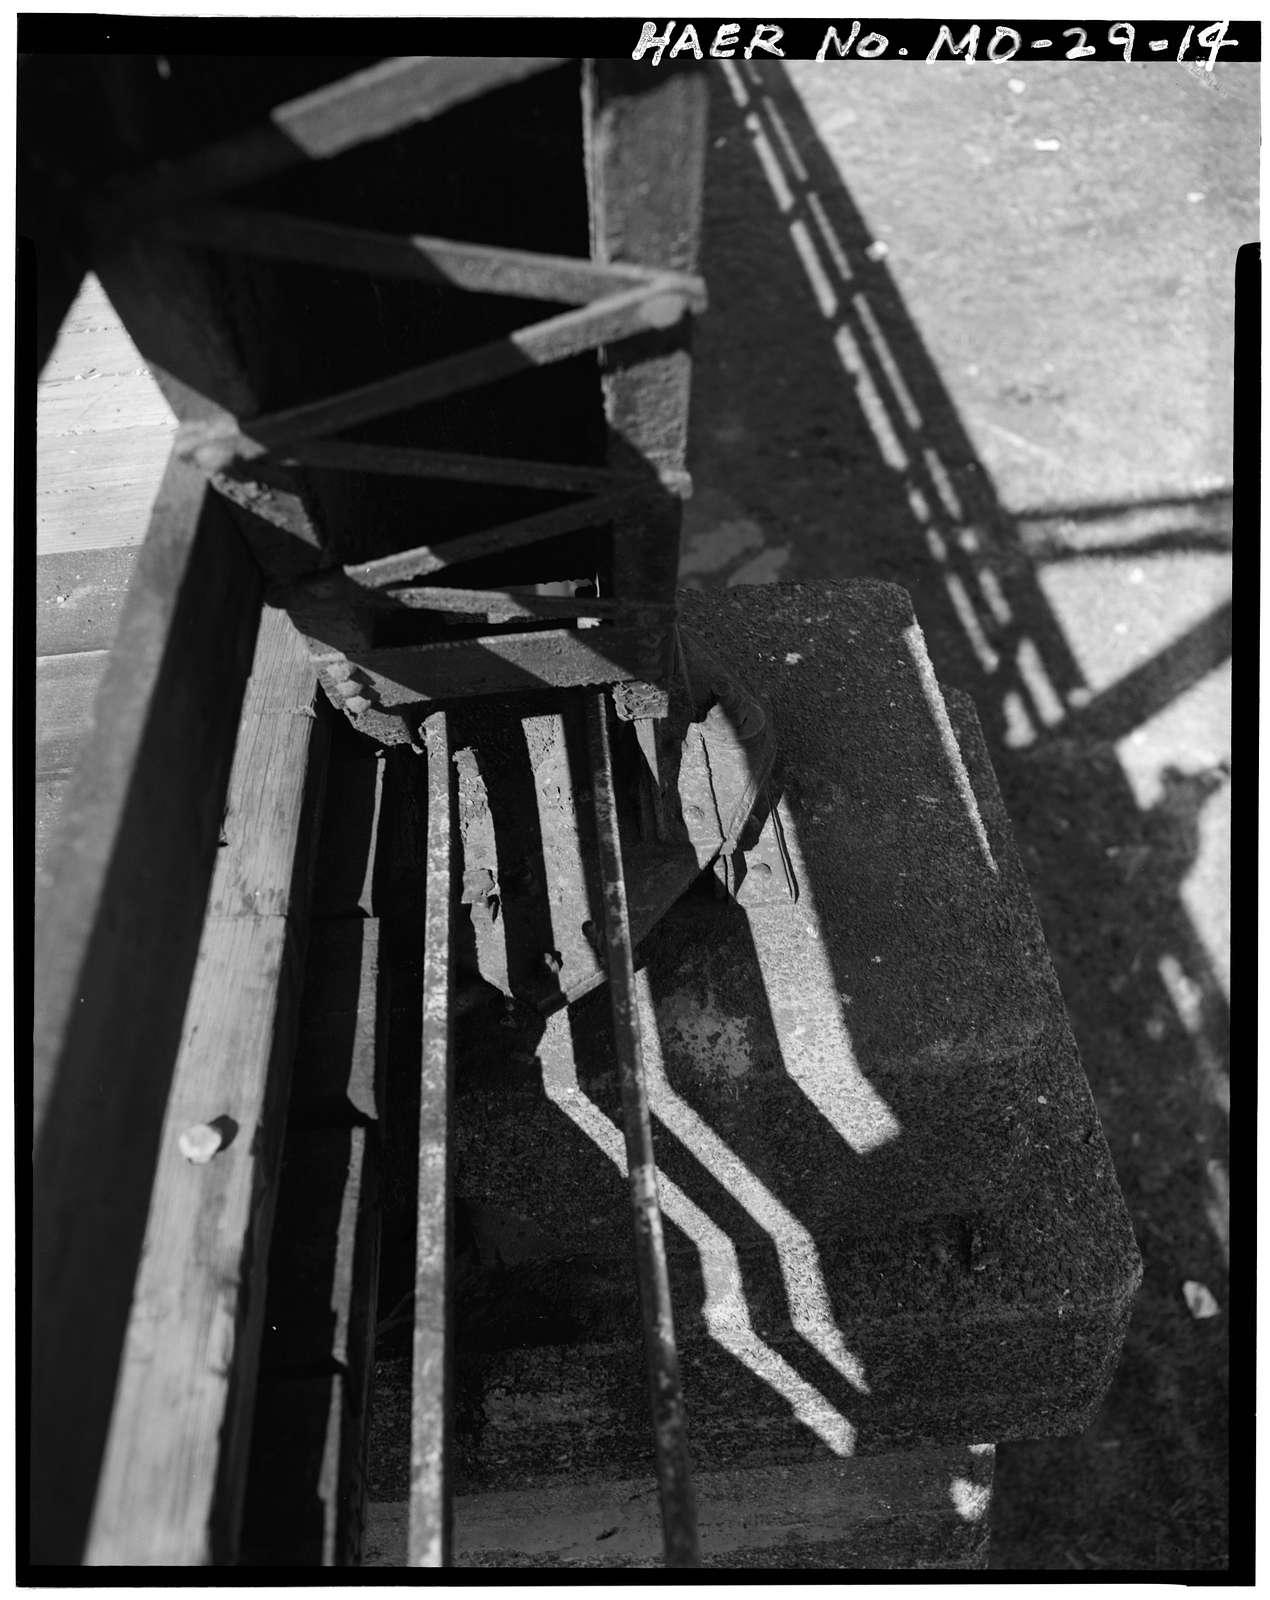 Washington Avenue Bridge, Spanning Missouri Pacific Railroad tracks, Main & St. Louis Streets, Sedalia, Pettis County, MO